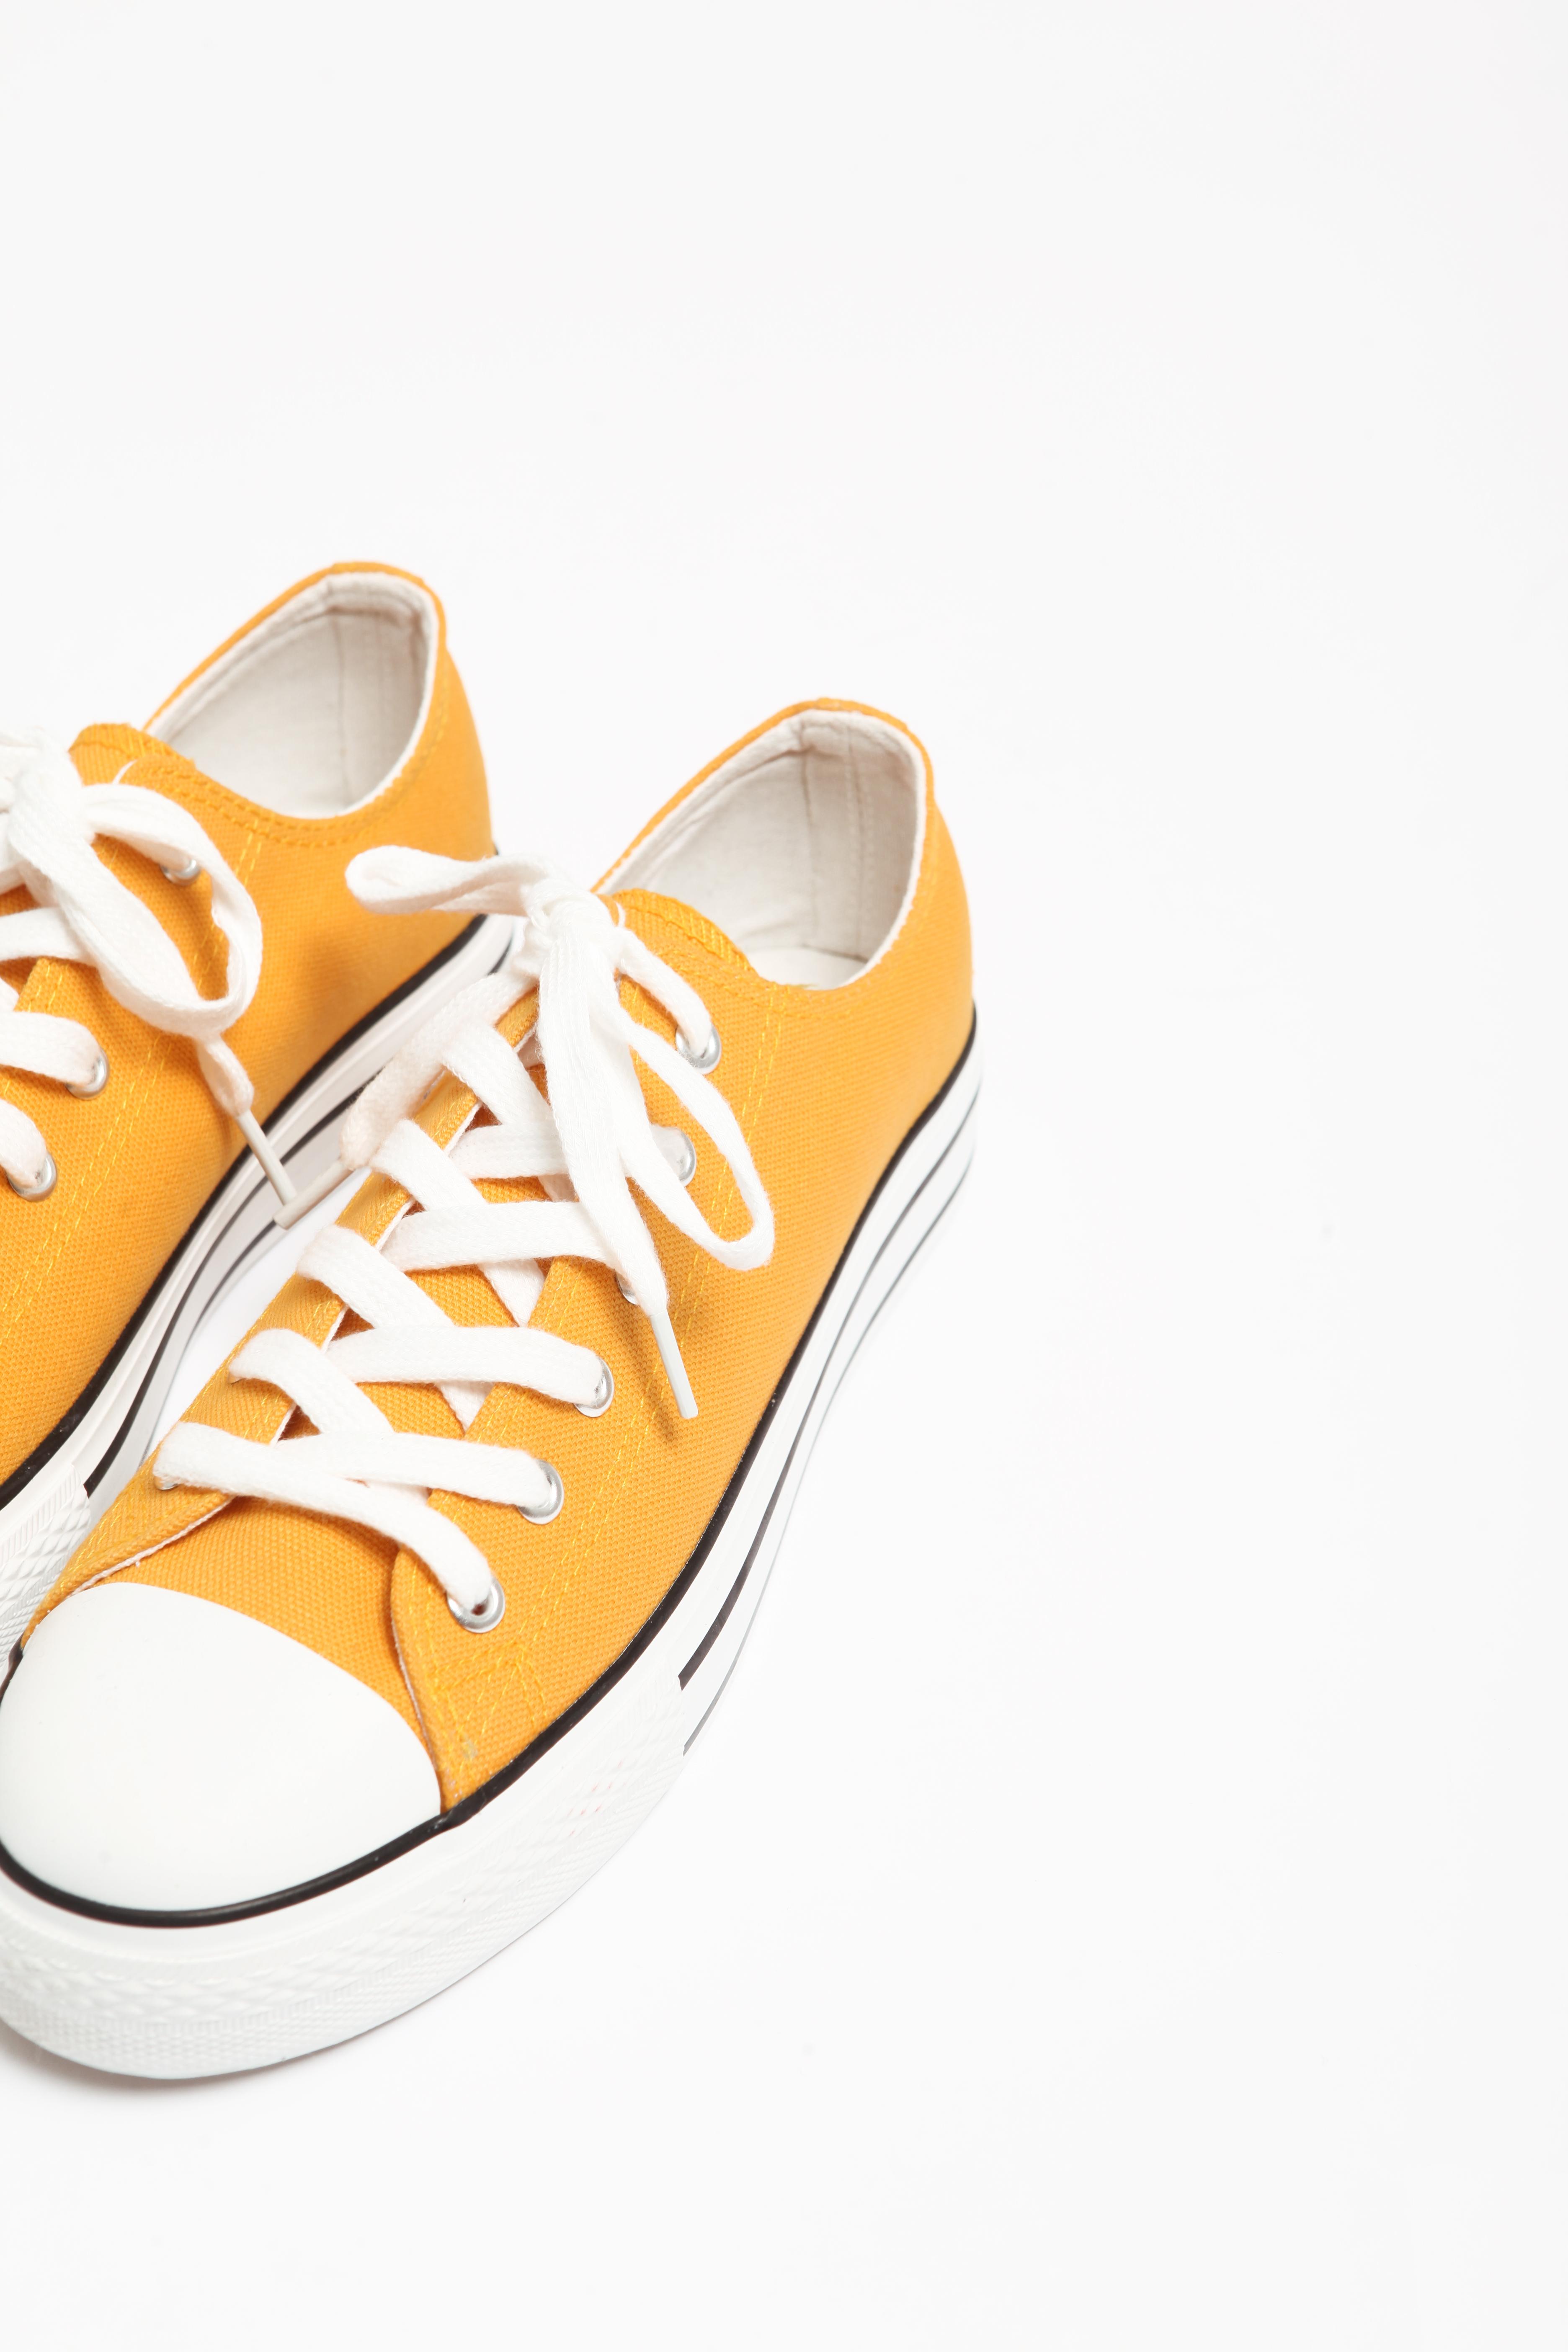 Baskets en toile jaune - Pimkie